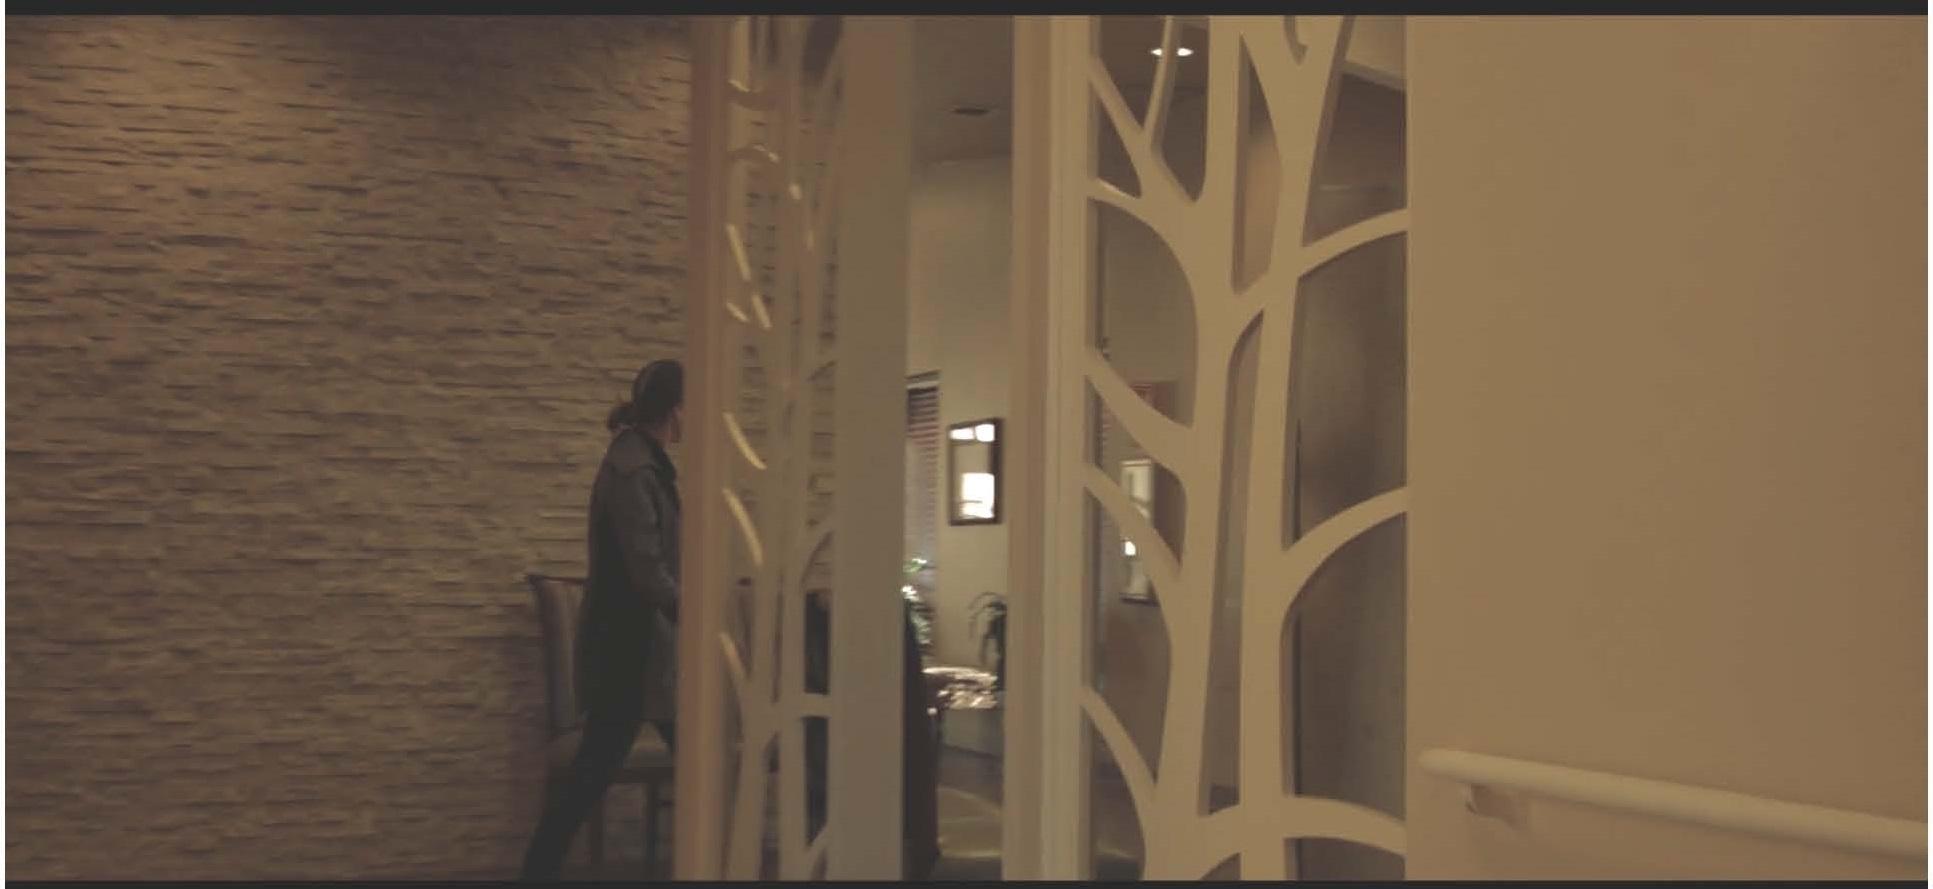 Mentis Neuro - El Paso Location Virtual Tour-HD on Vimeo11